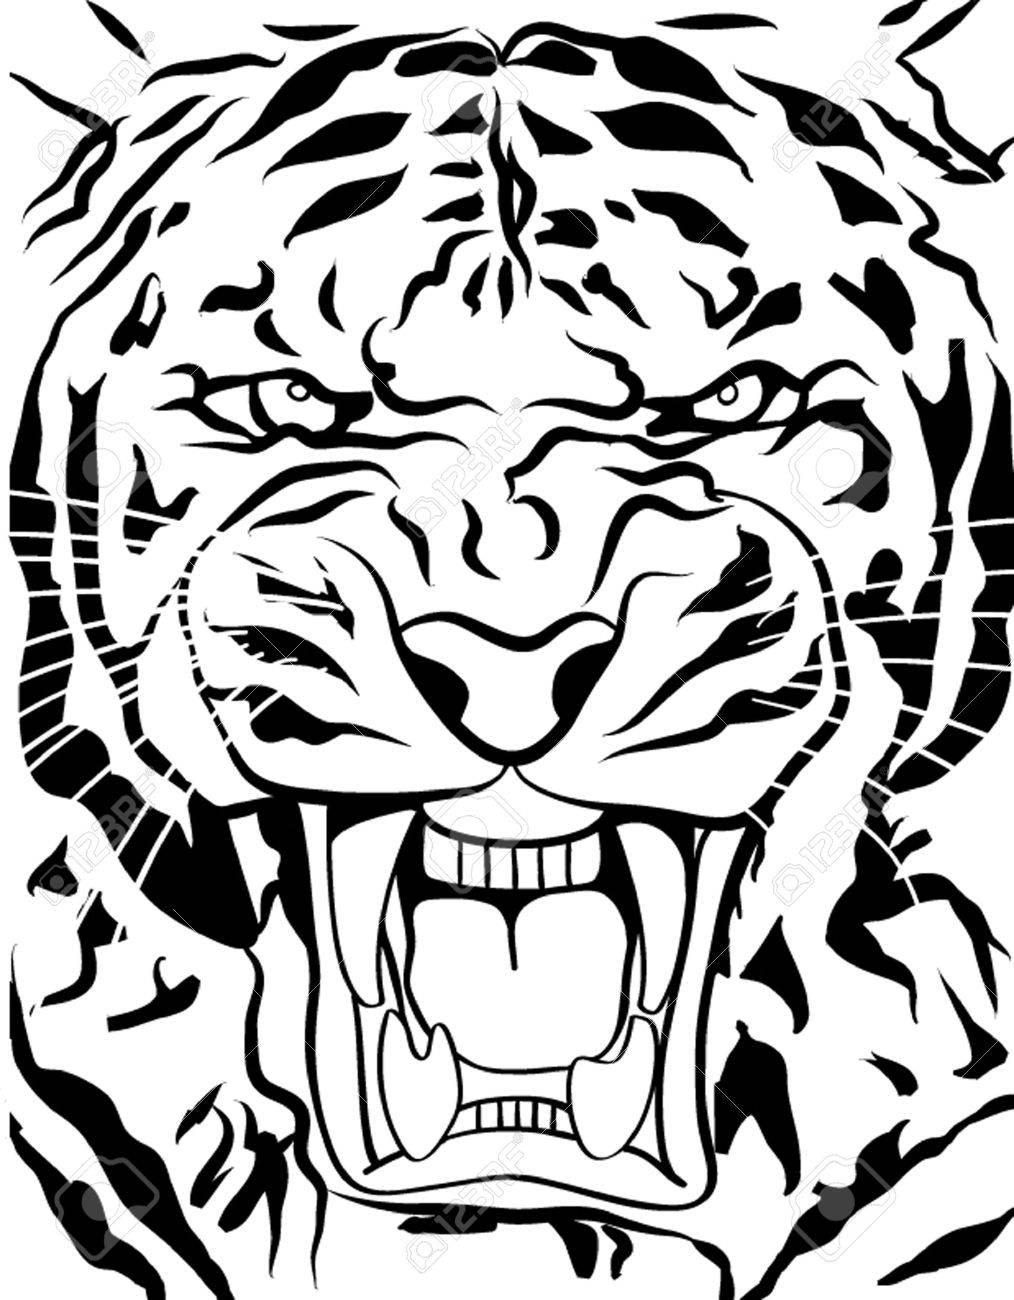 1014x1300 26128900 Tiger Roaring Outline Stock Vector